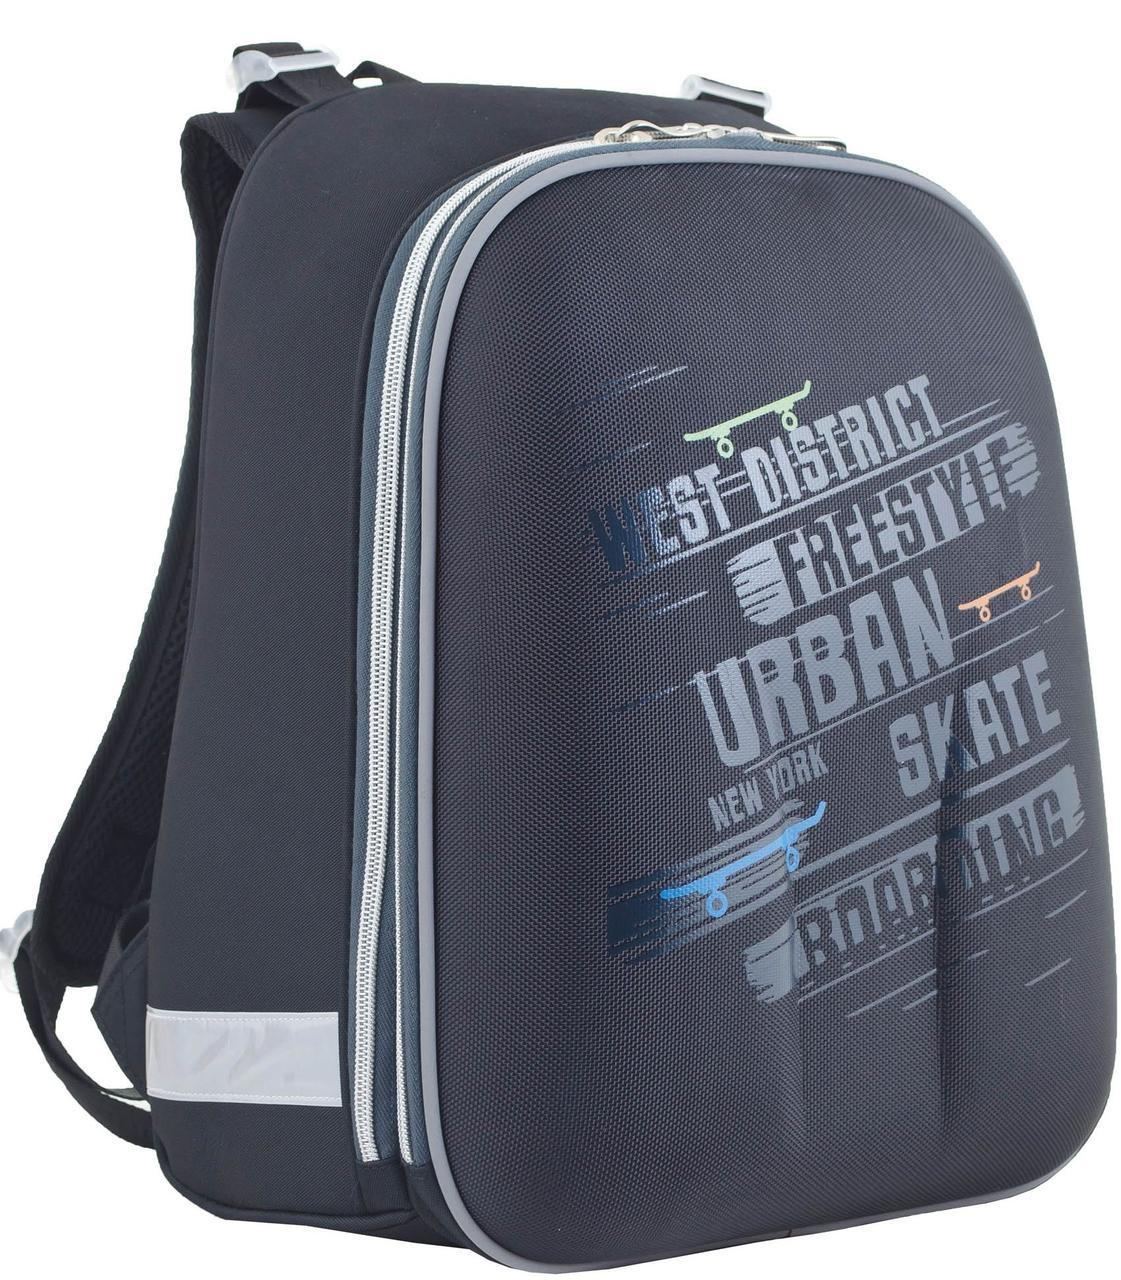 bde9d25b24f8 Школьный рюкзак для мальчика YES H-12 Skate, 553361 15 л - SUPERSUMKA  интернет